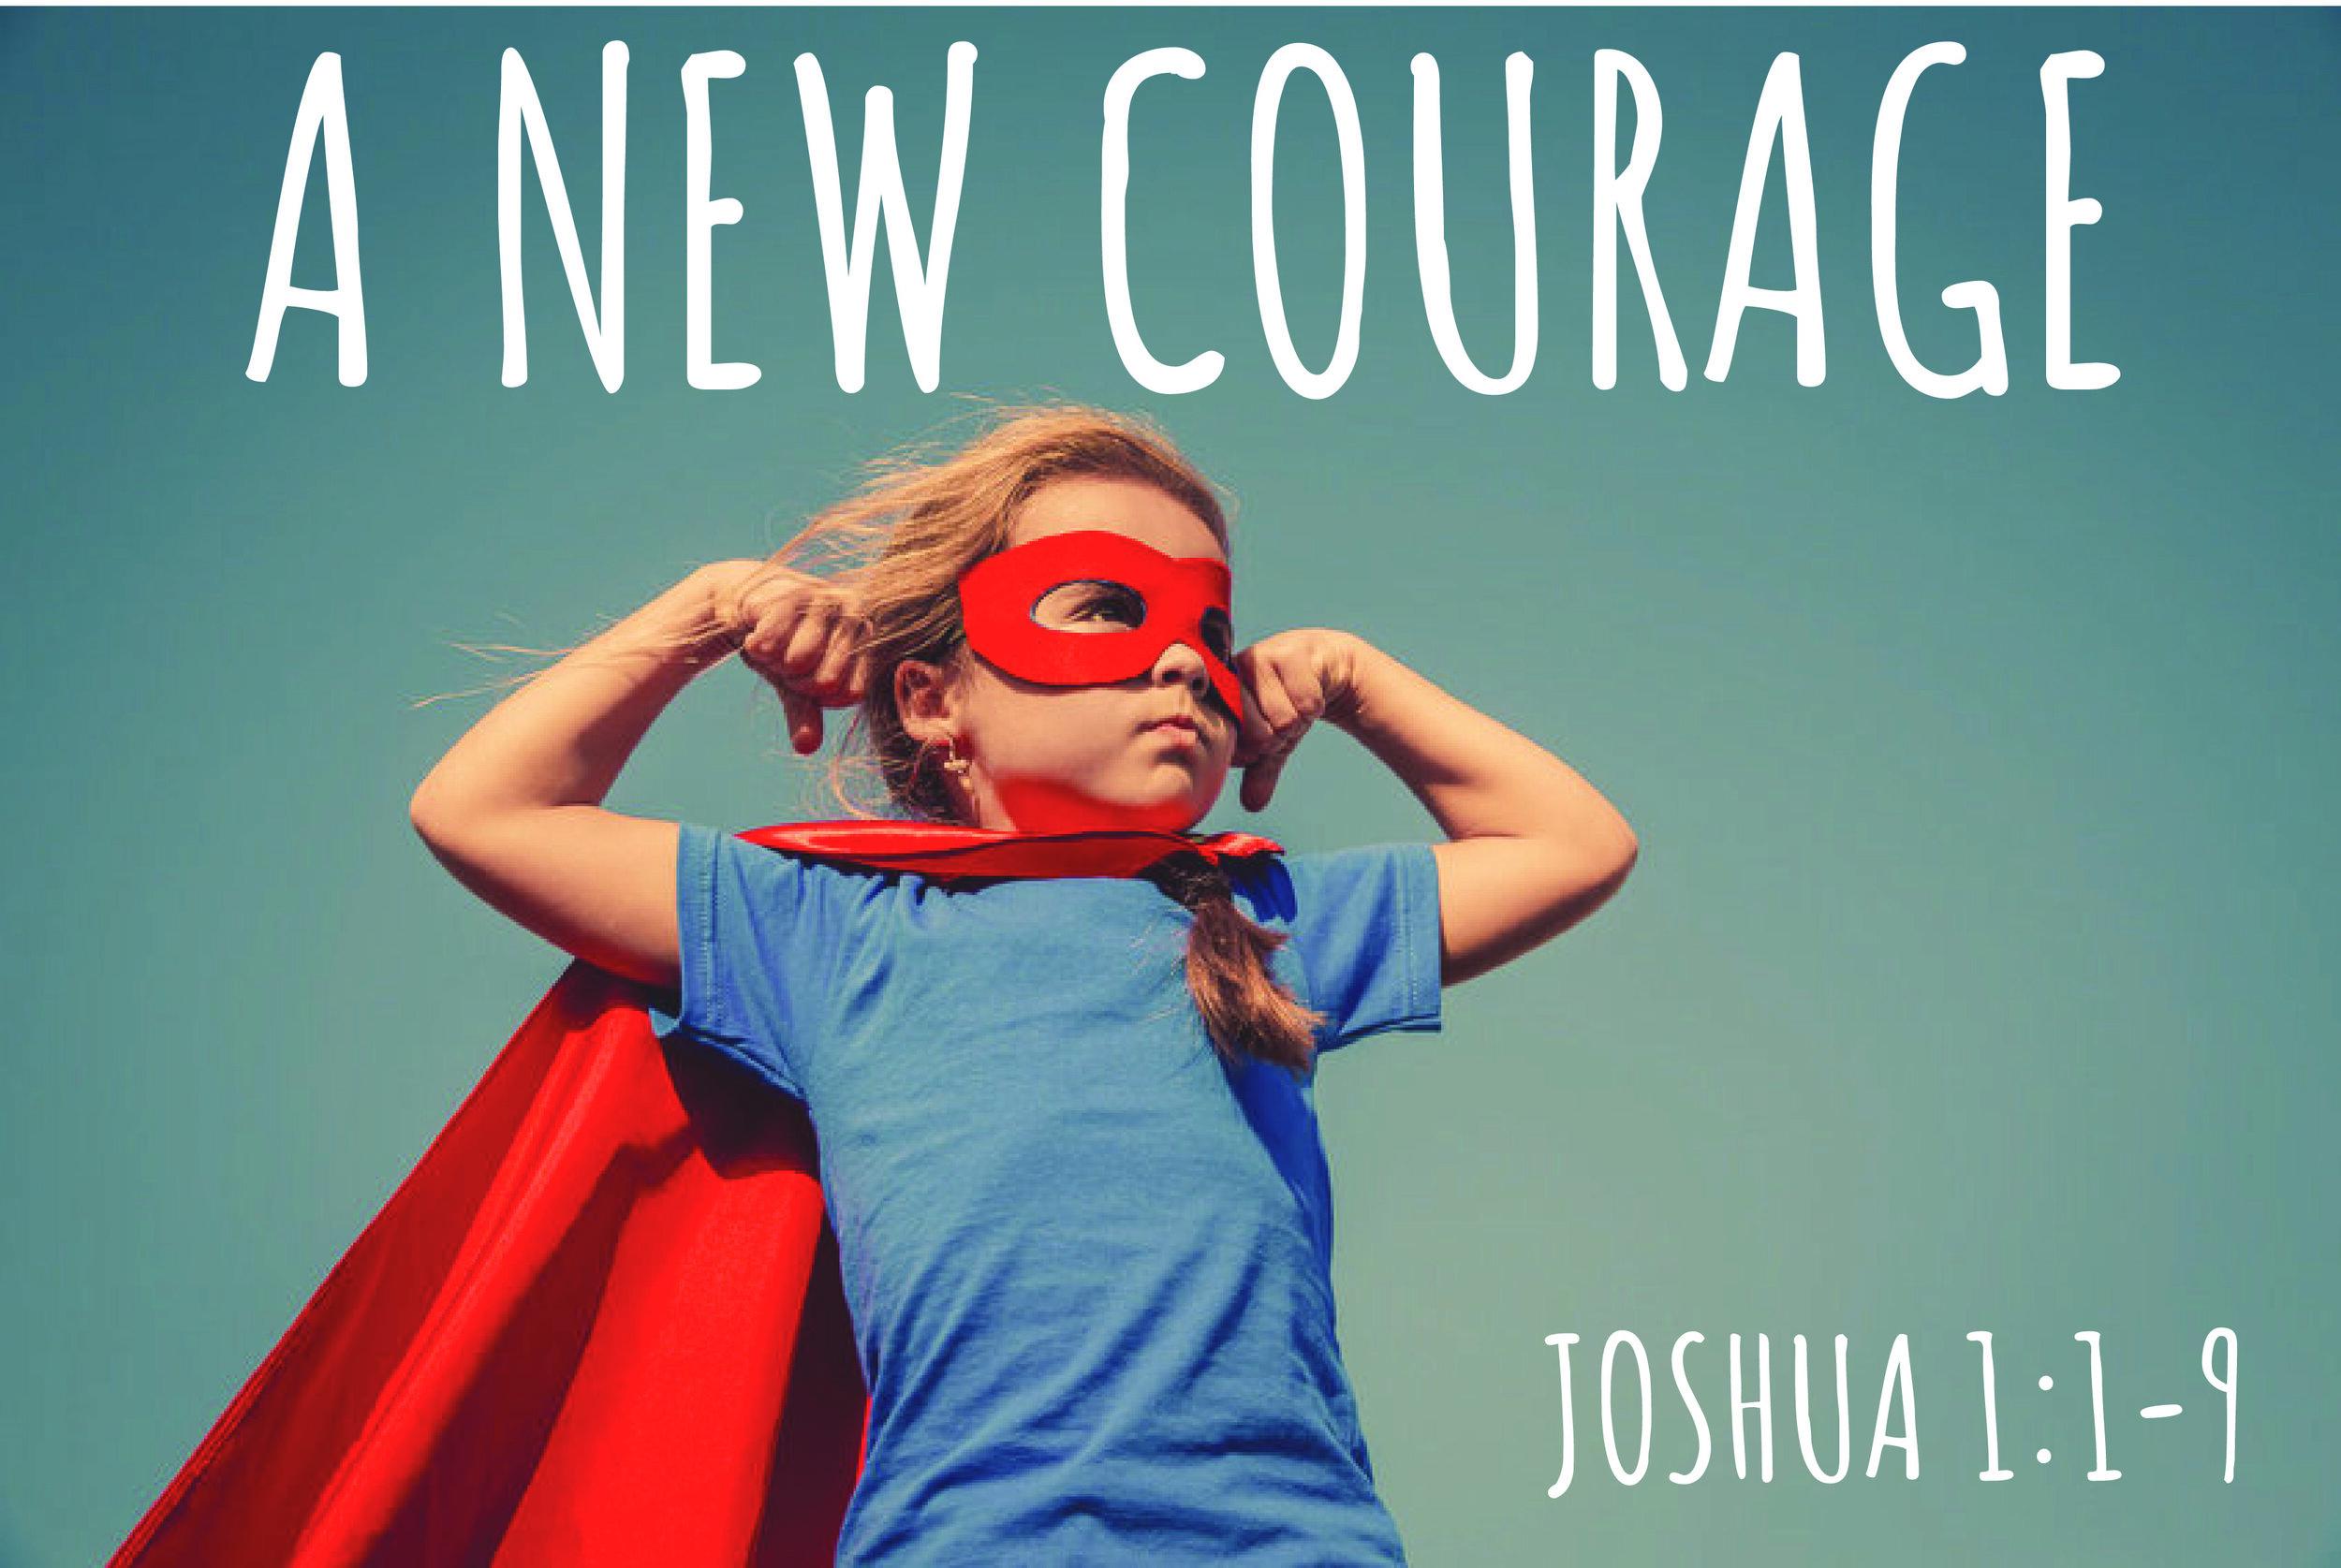 courage-01.jpg